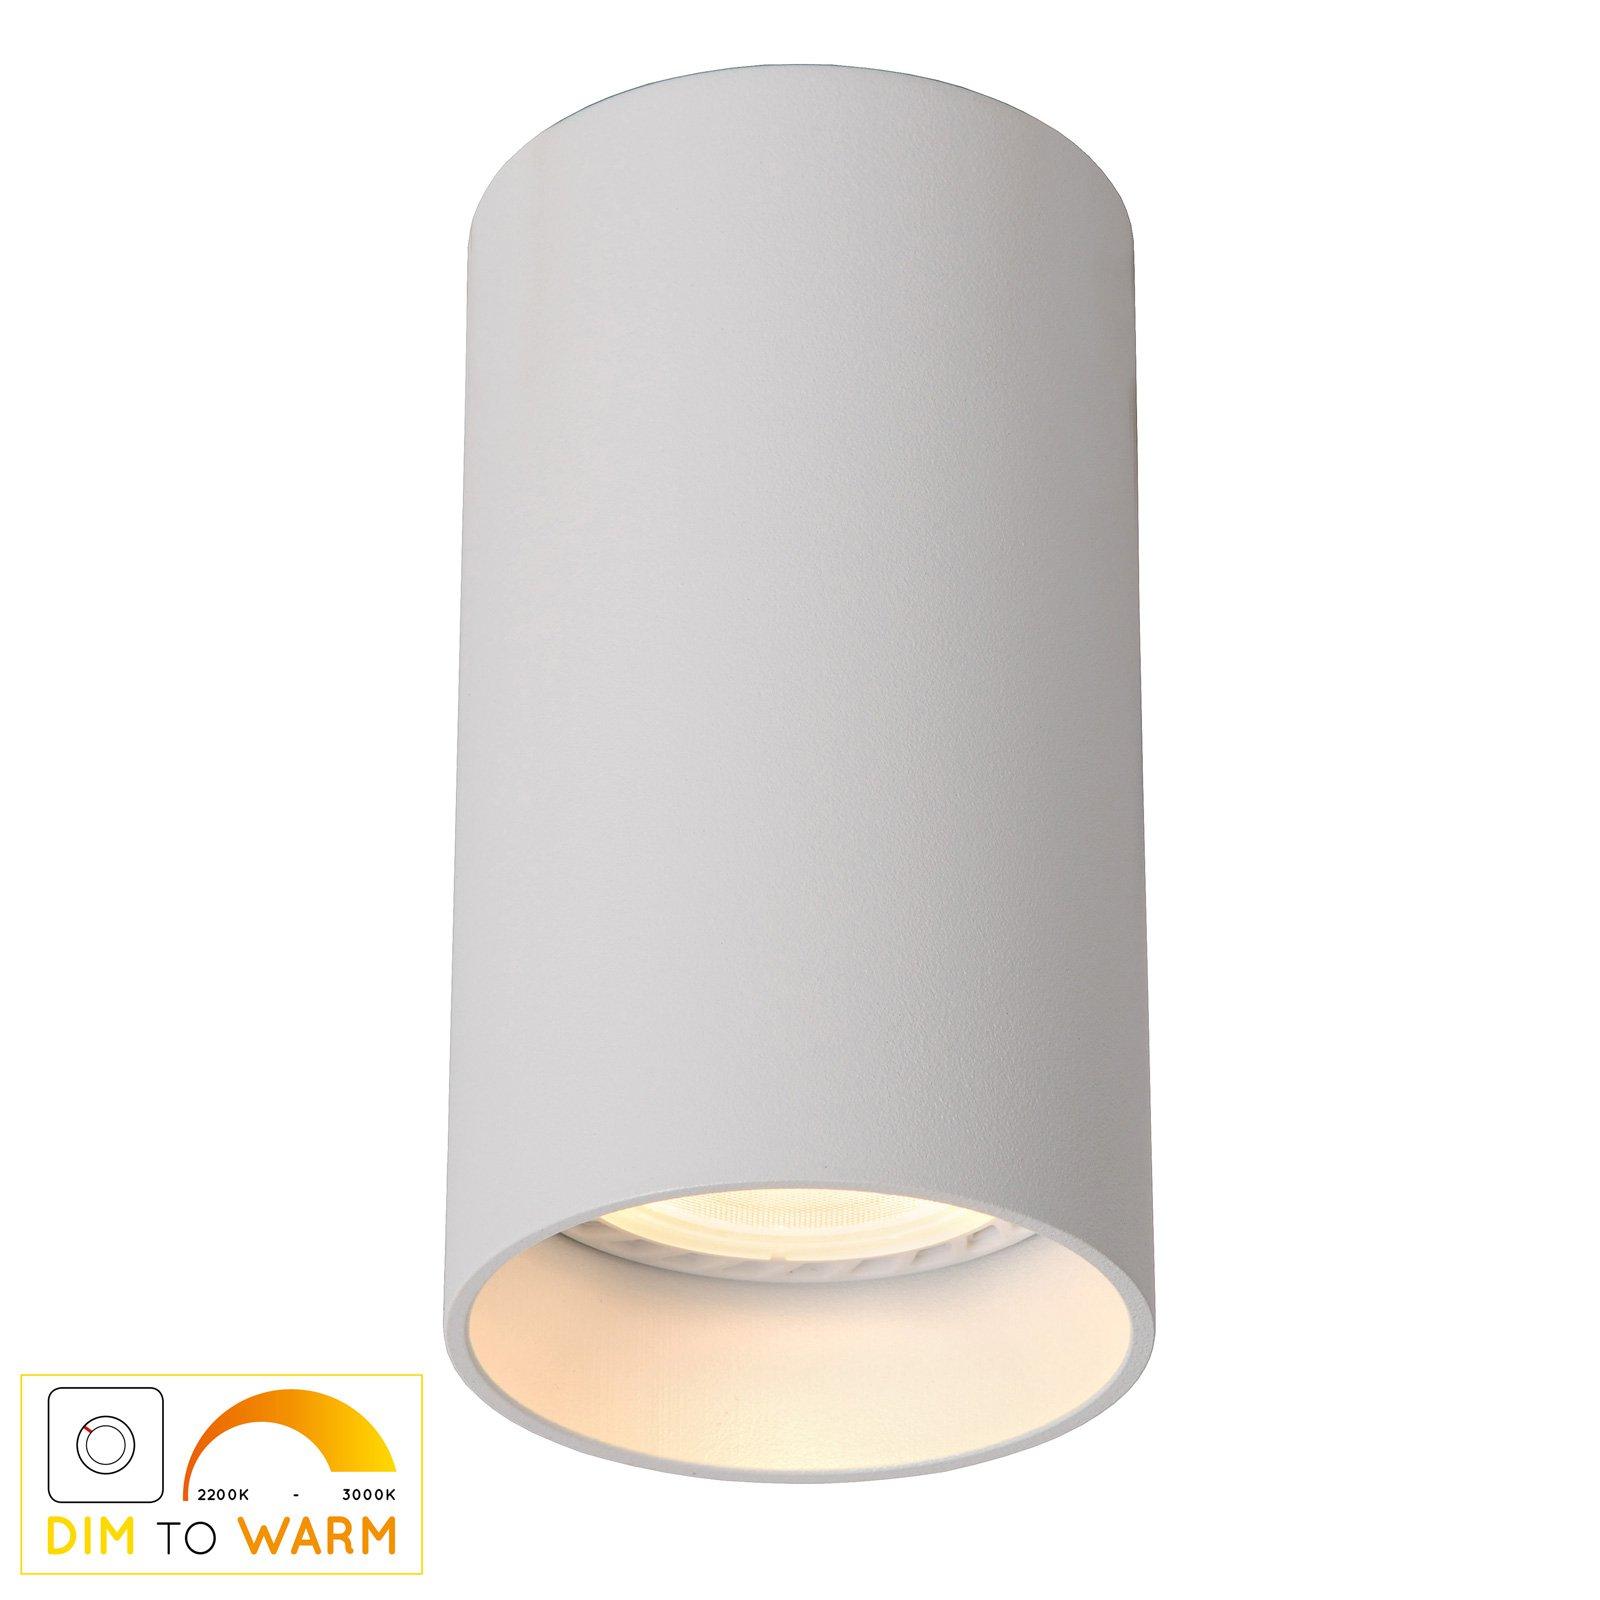 Delto LED-taklampe dim to warm, rund, hvit